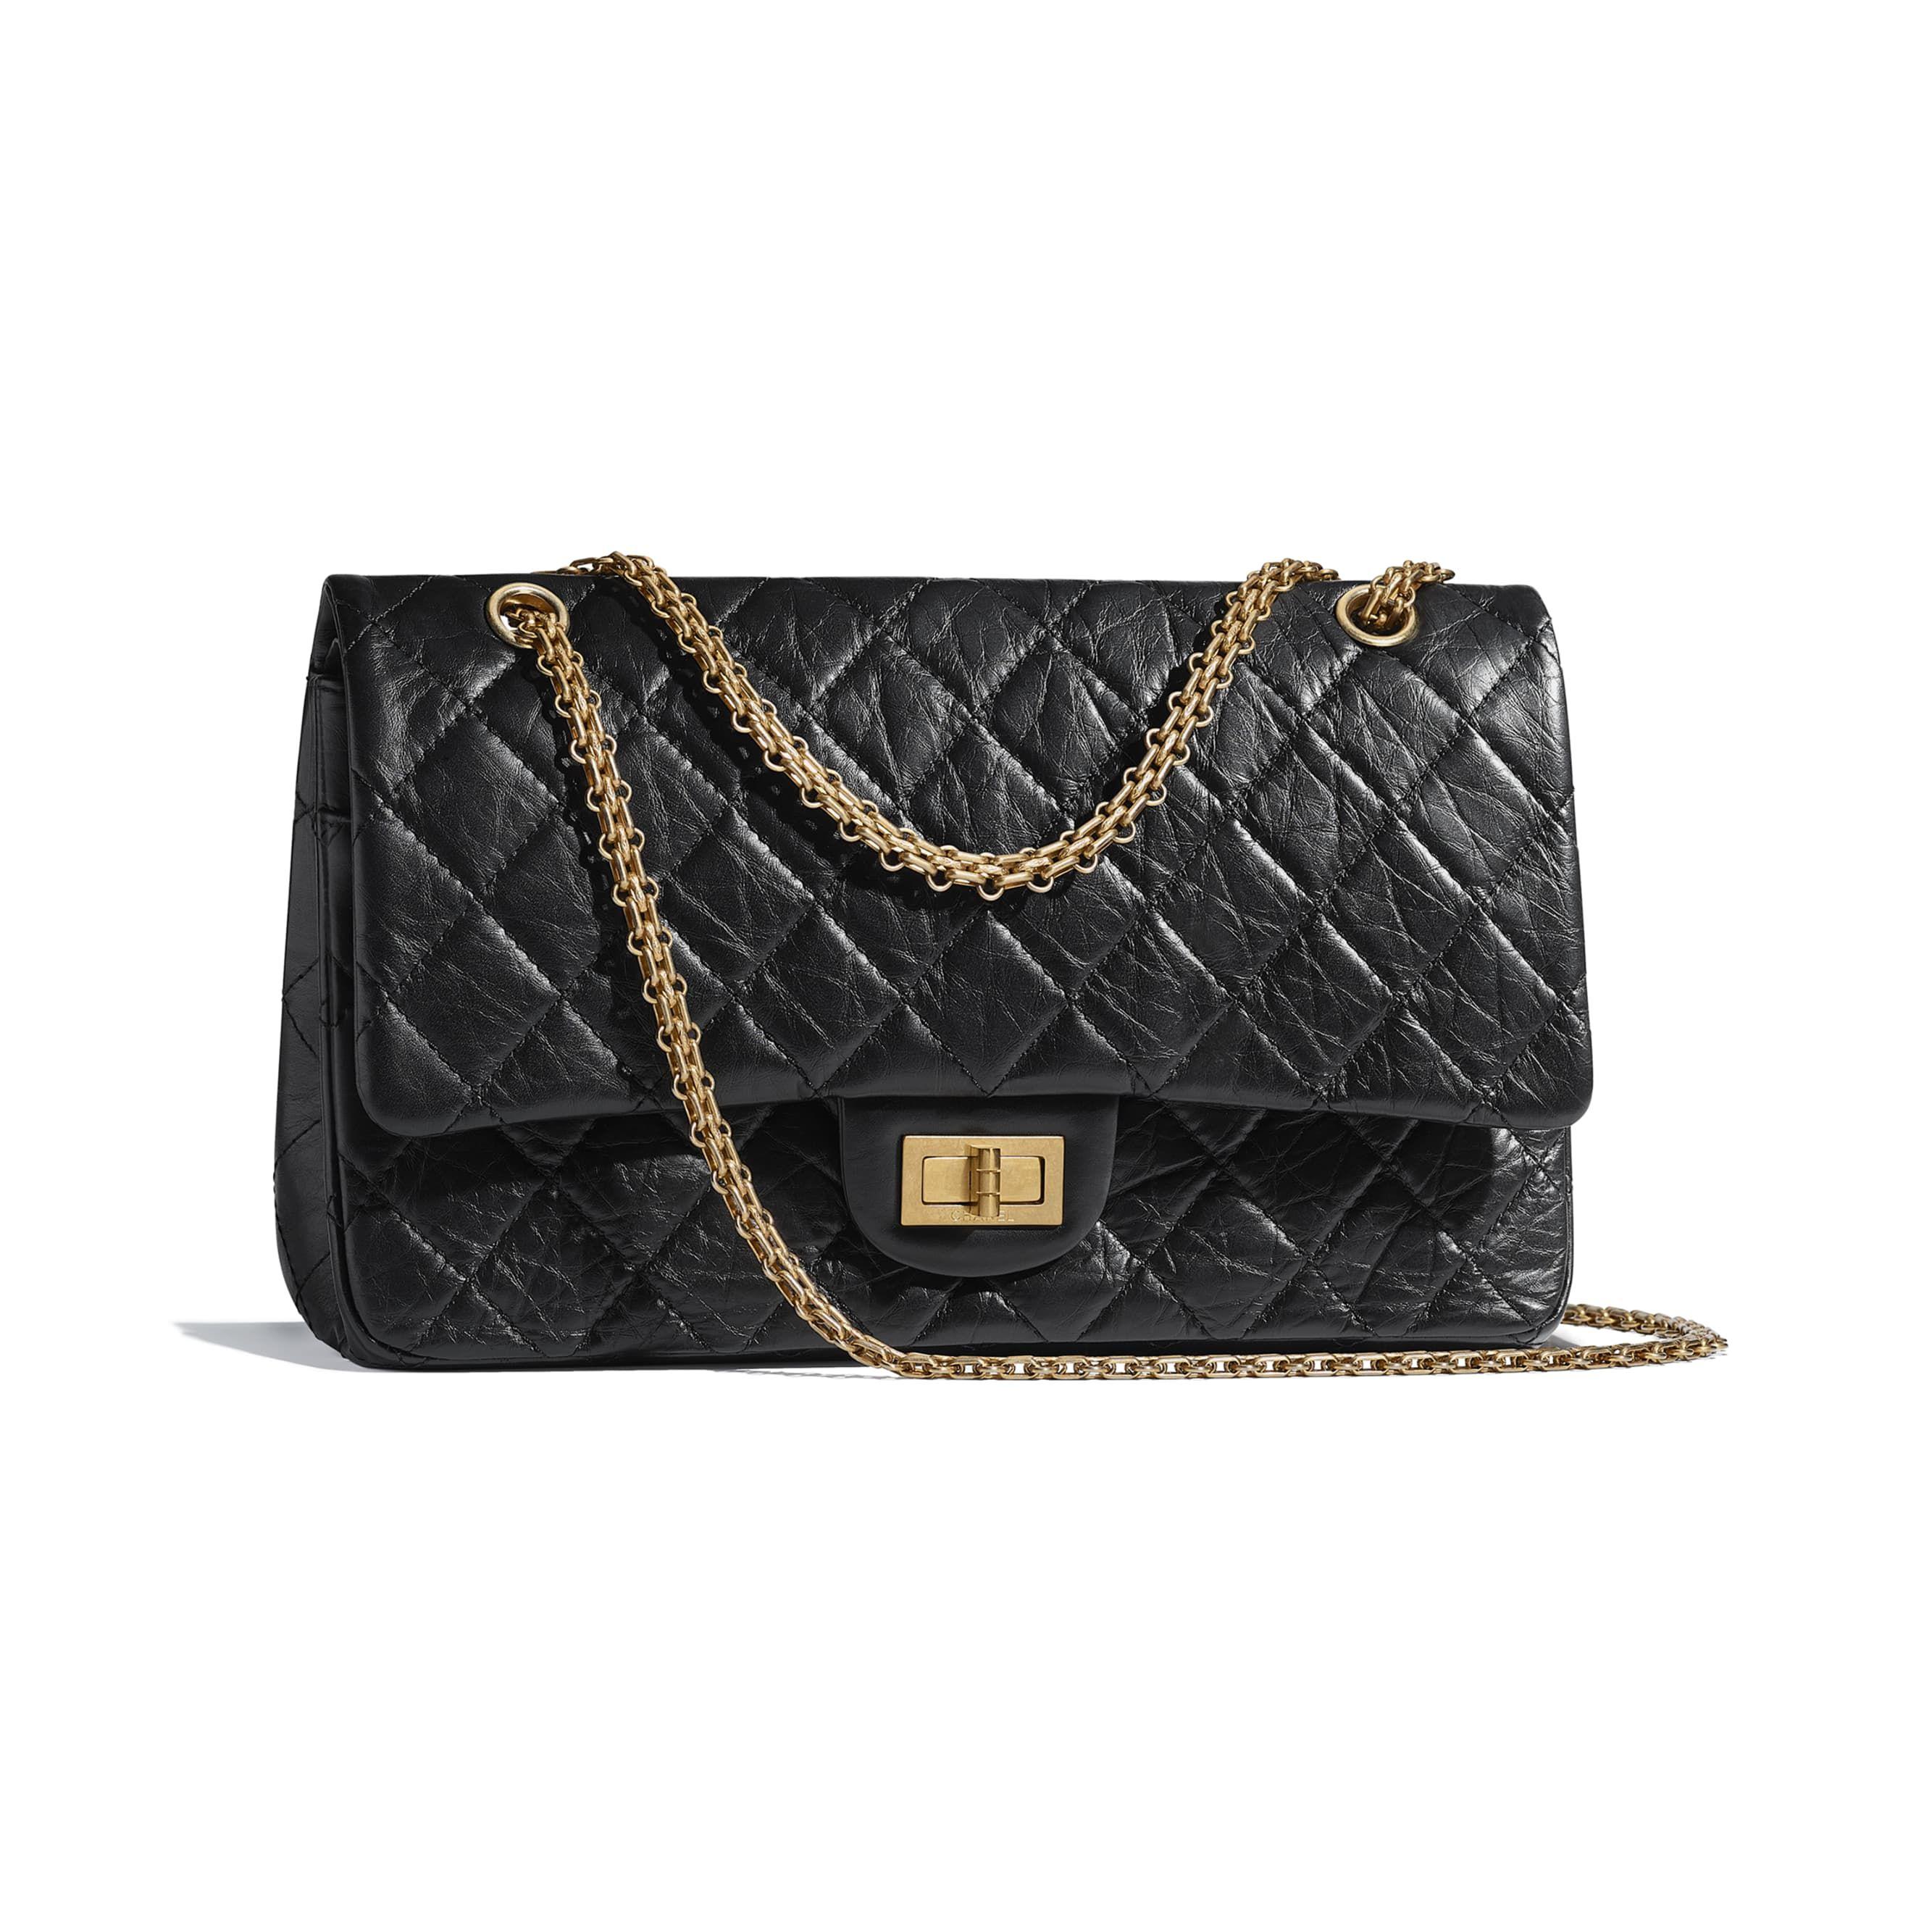 4fcf6c1177ec Maxi 2.55 Handbag - Black - Aged Calfskin & Gold-Tone Metal - Other view -  see standard sized version